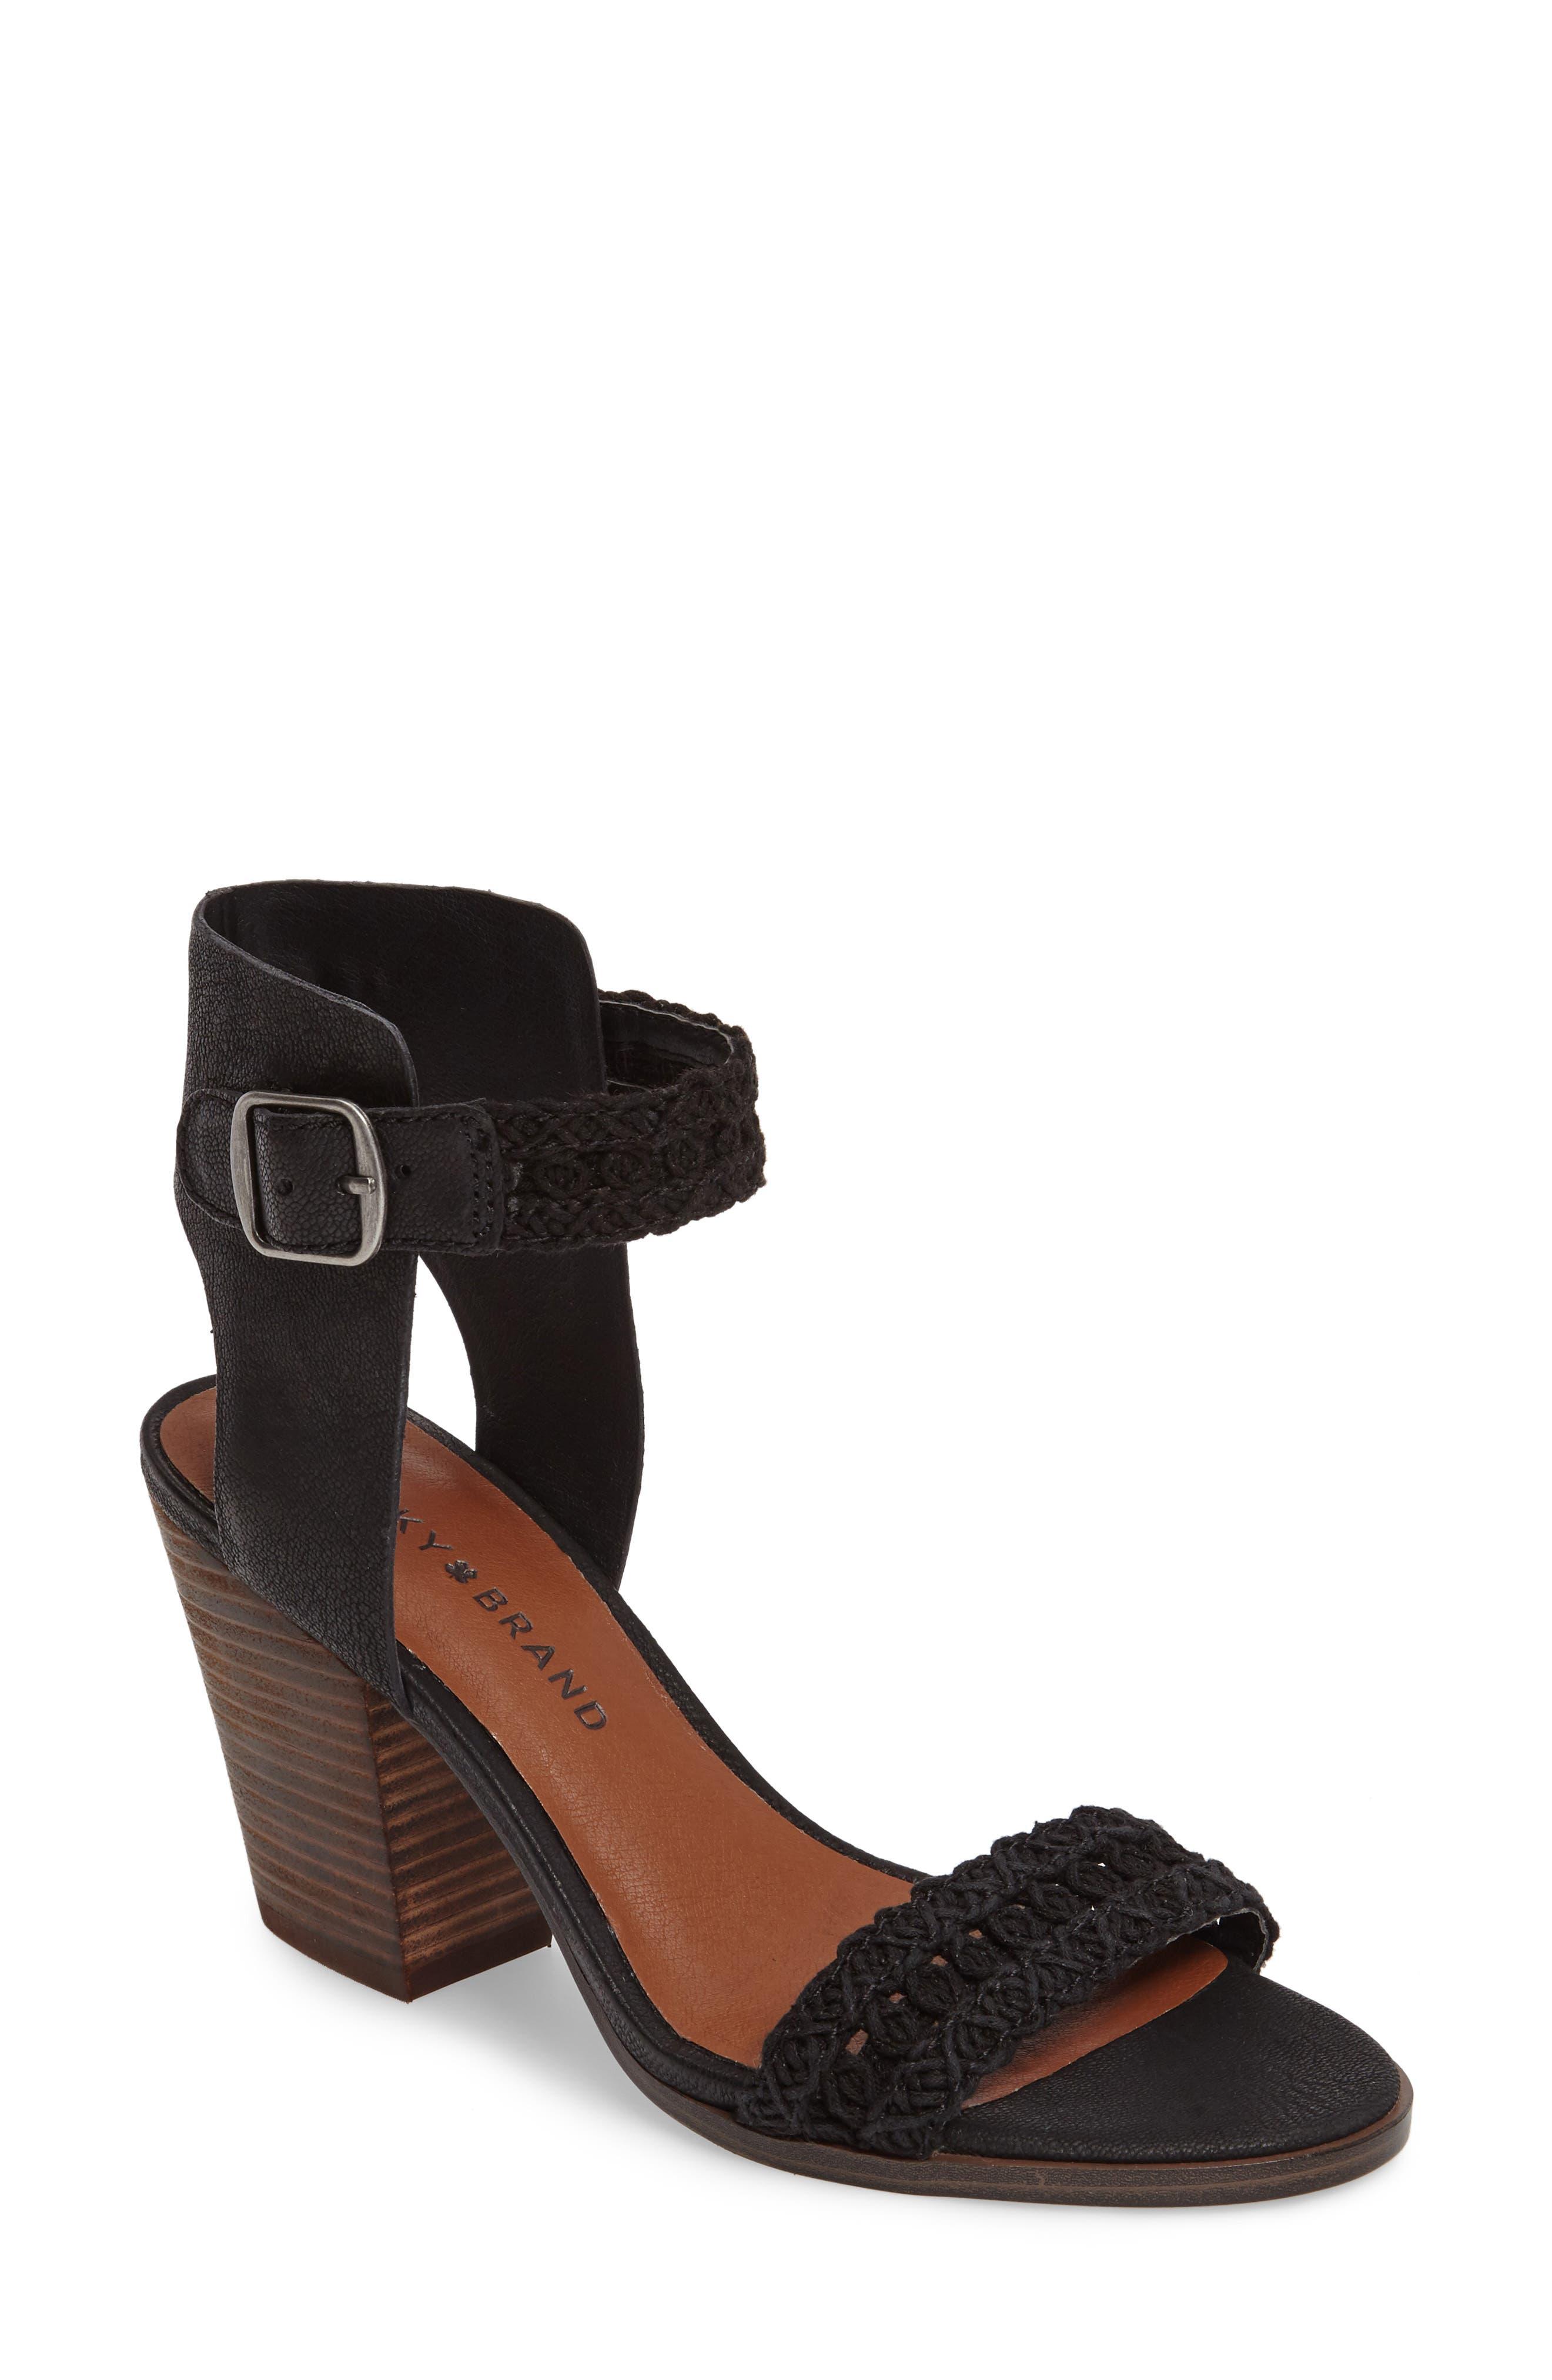 Oakes Ankle Strap Sandal,                             Main thumbnail 1, color,                             Black Leather